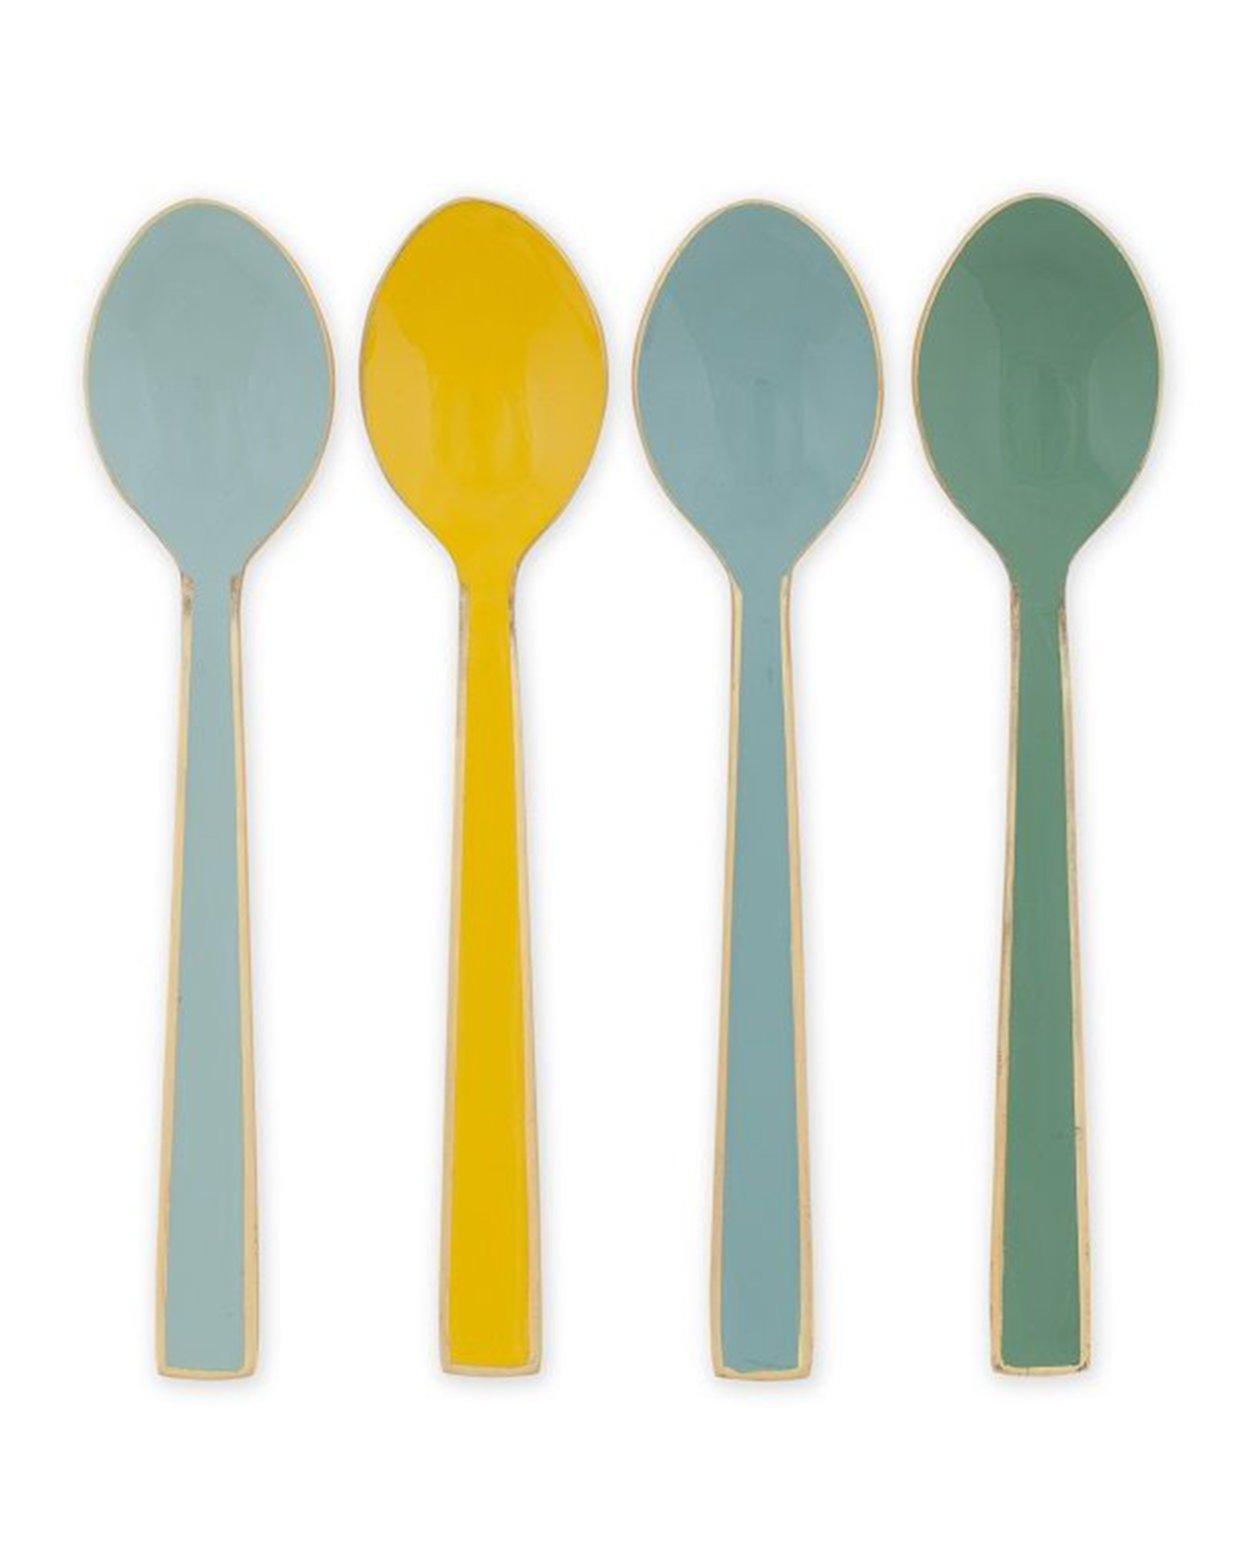 Blushing Birds Enamel Spoons - Four Piece Set